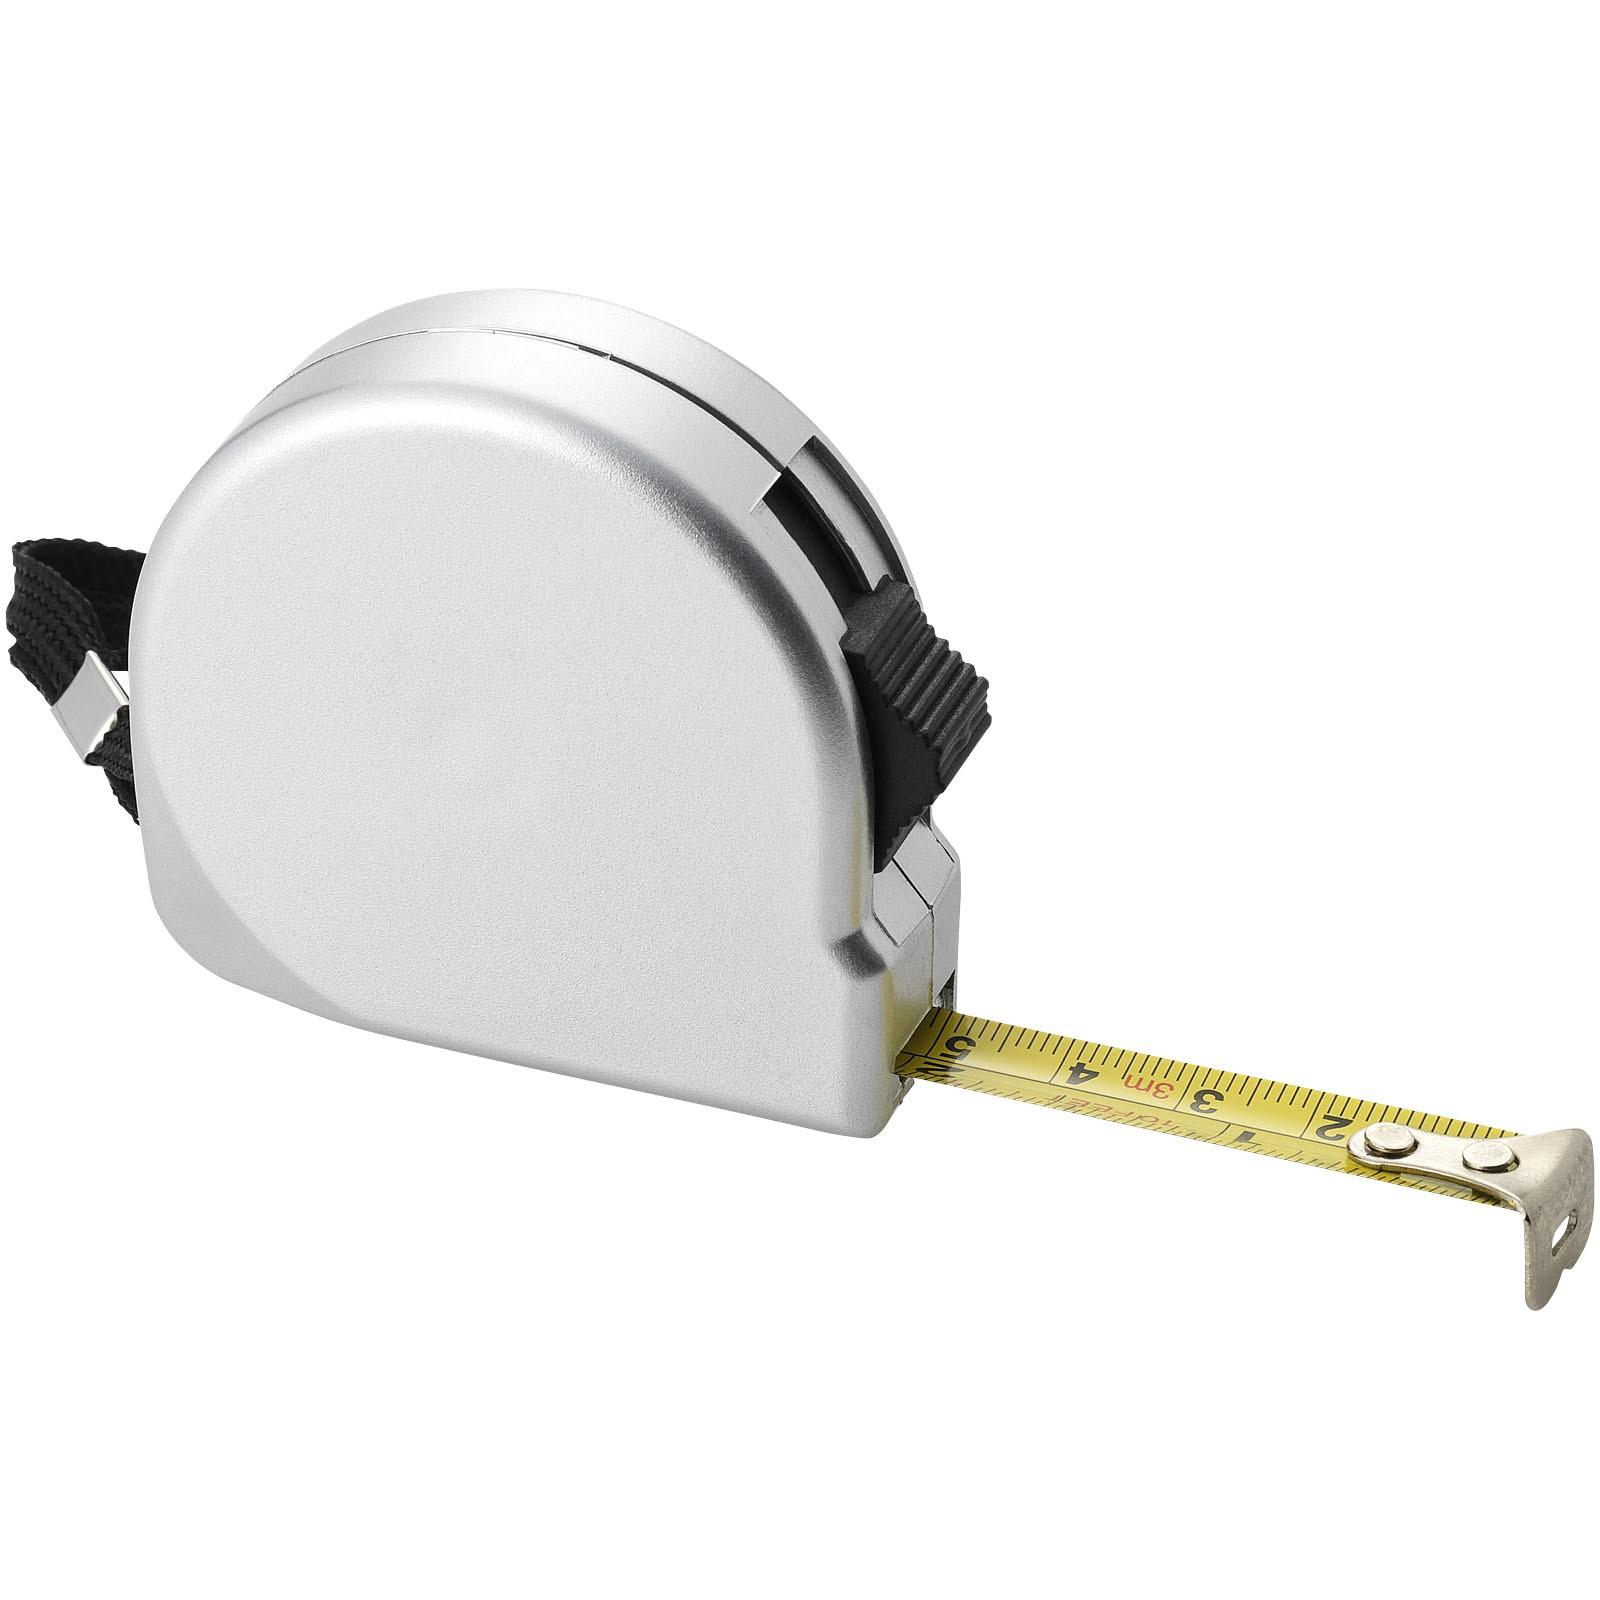 Měřicí pásmo Clark, 3 m - Stříbrný